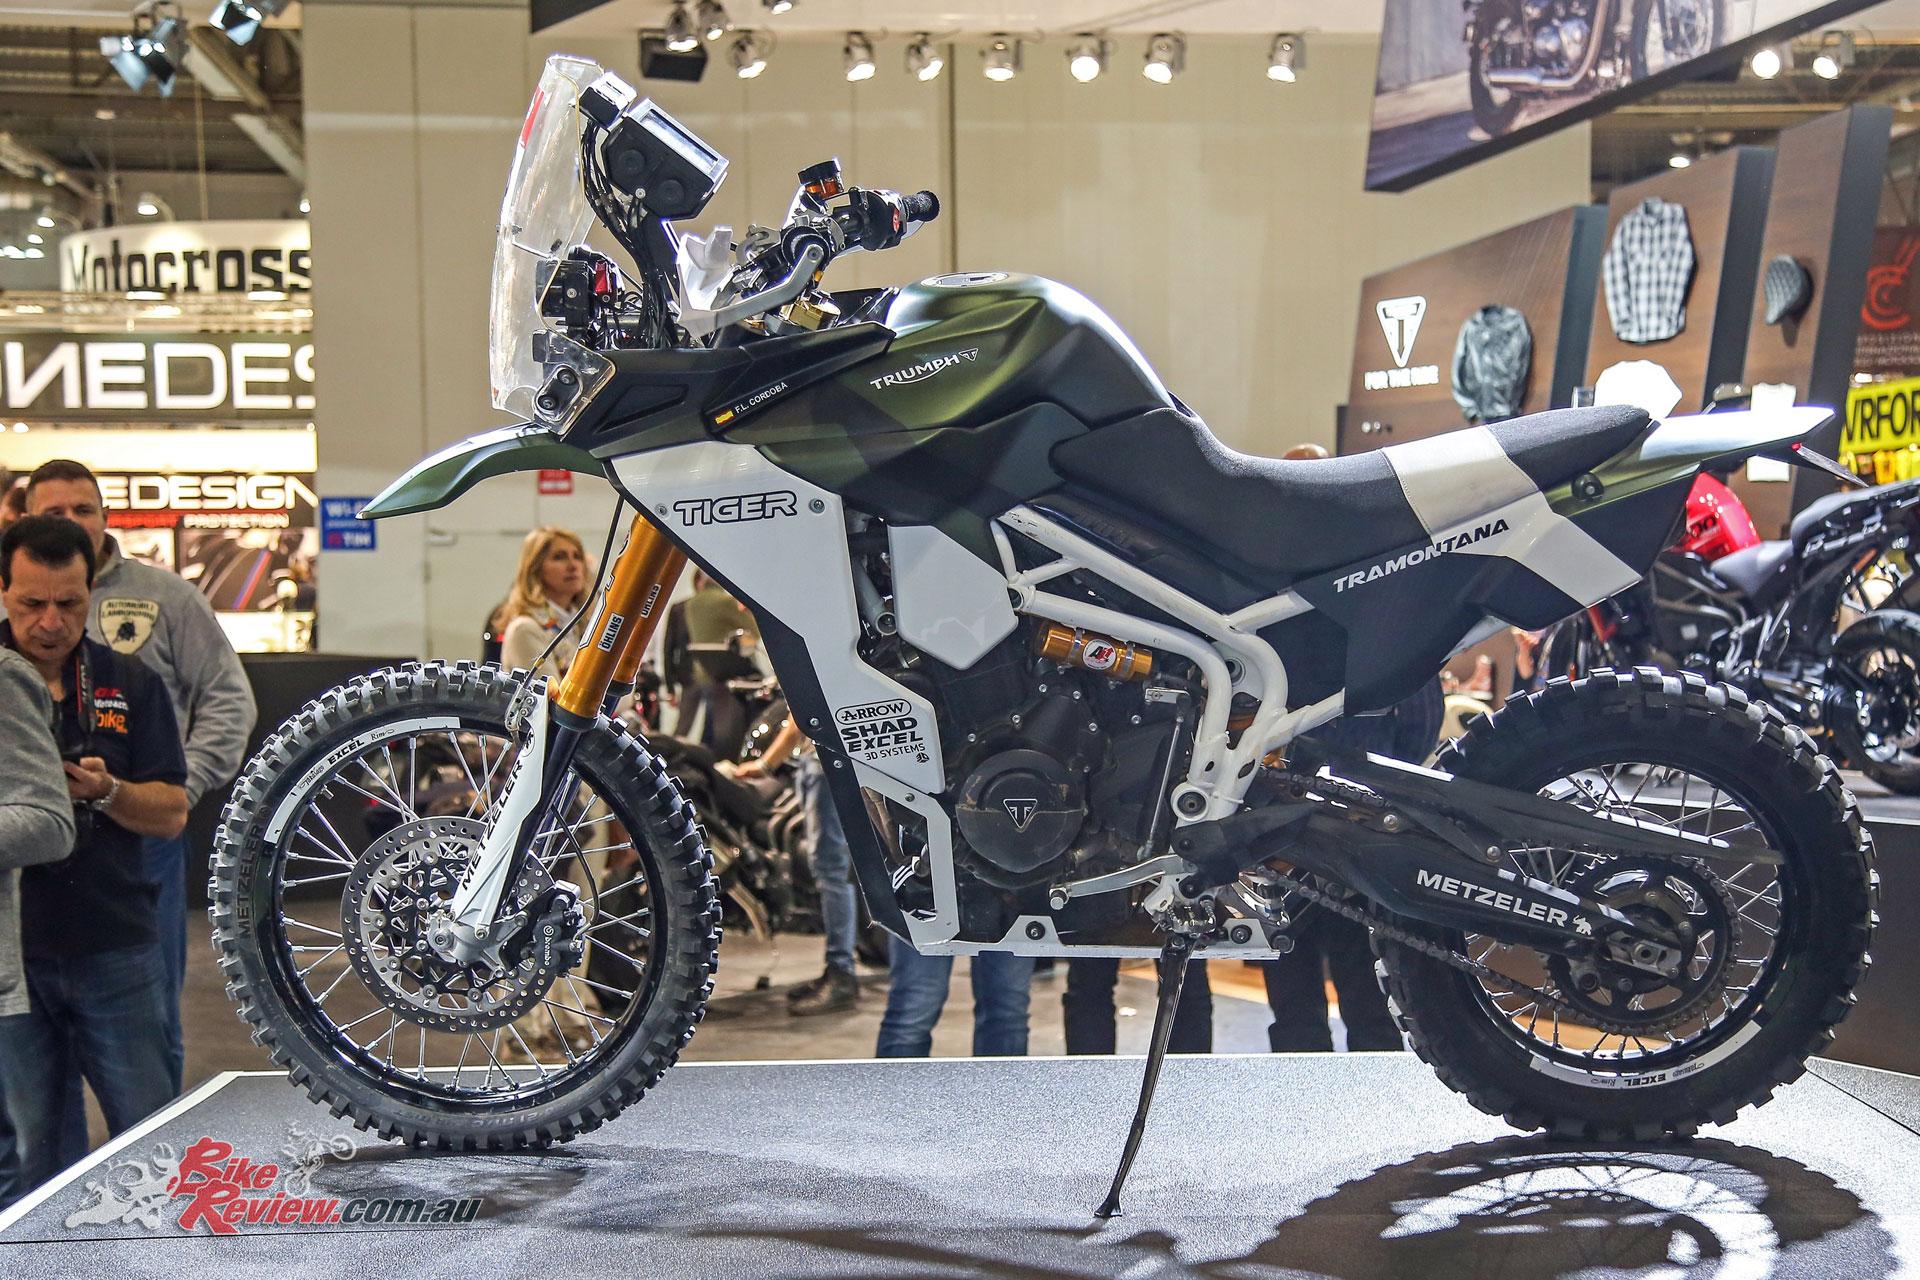 Triumph Launch New 2018 Tiger 1200xc Xr Bike Review